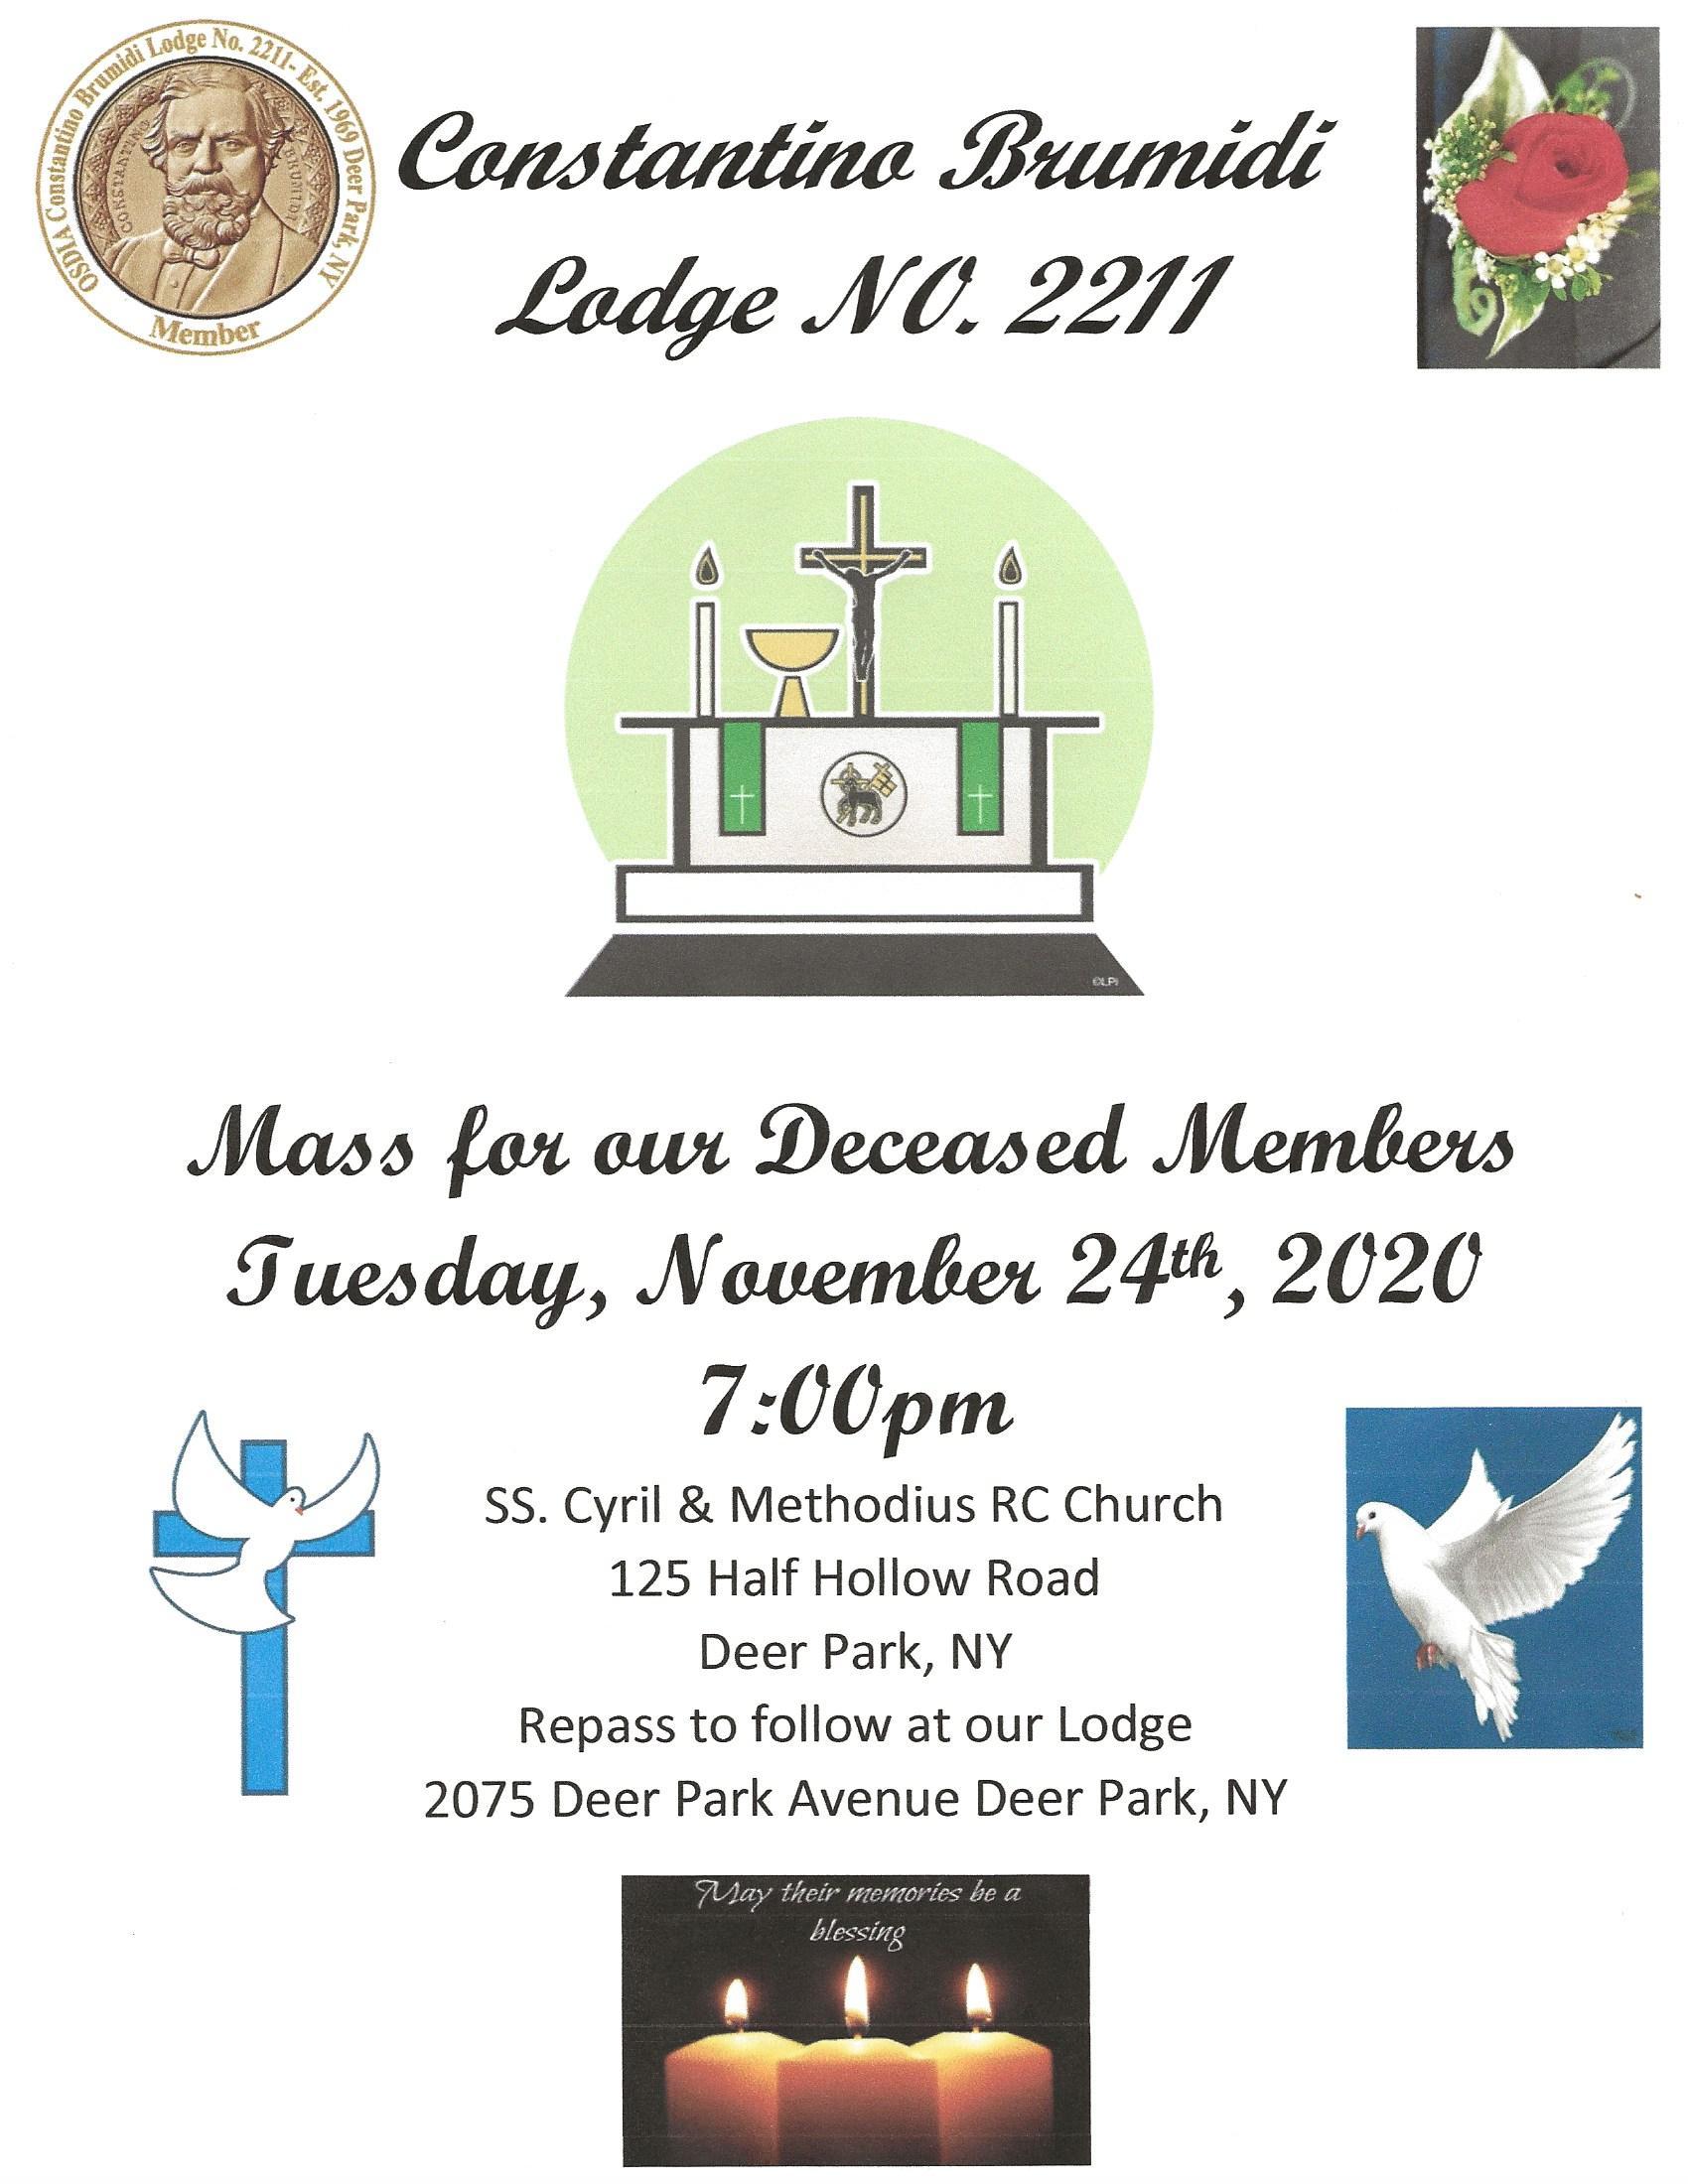 Mass for Deceased flyer 2020